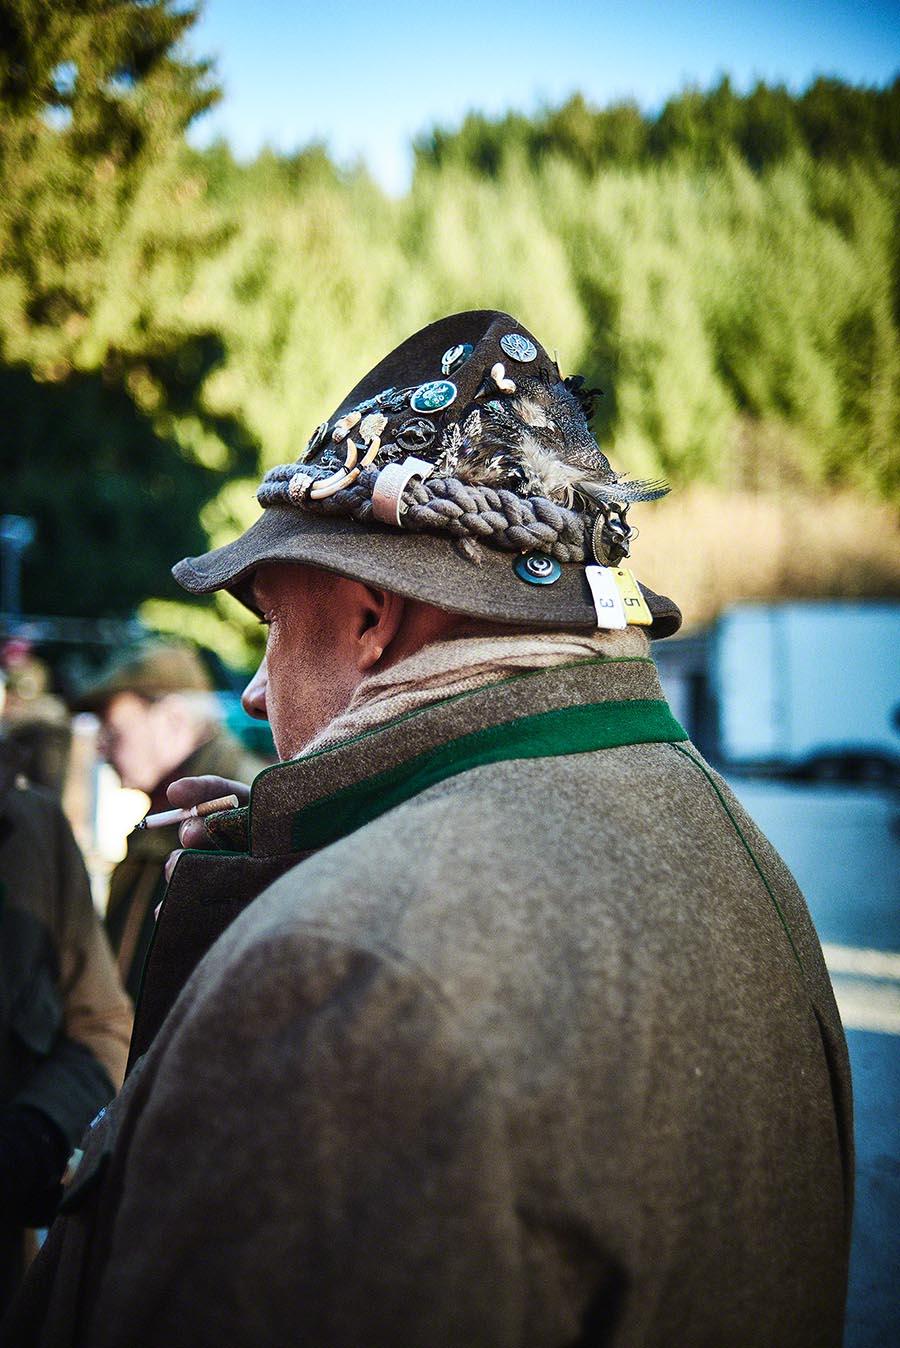 Jagd-Kleidung - Jagd-Reportage mit Sternekoch Harald und Maximilian Rüssel Fotos: neon fotografie